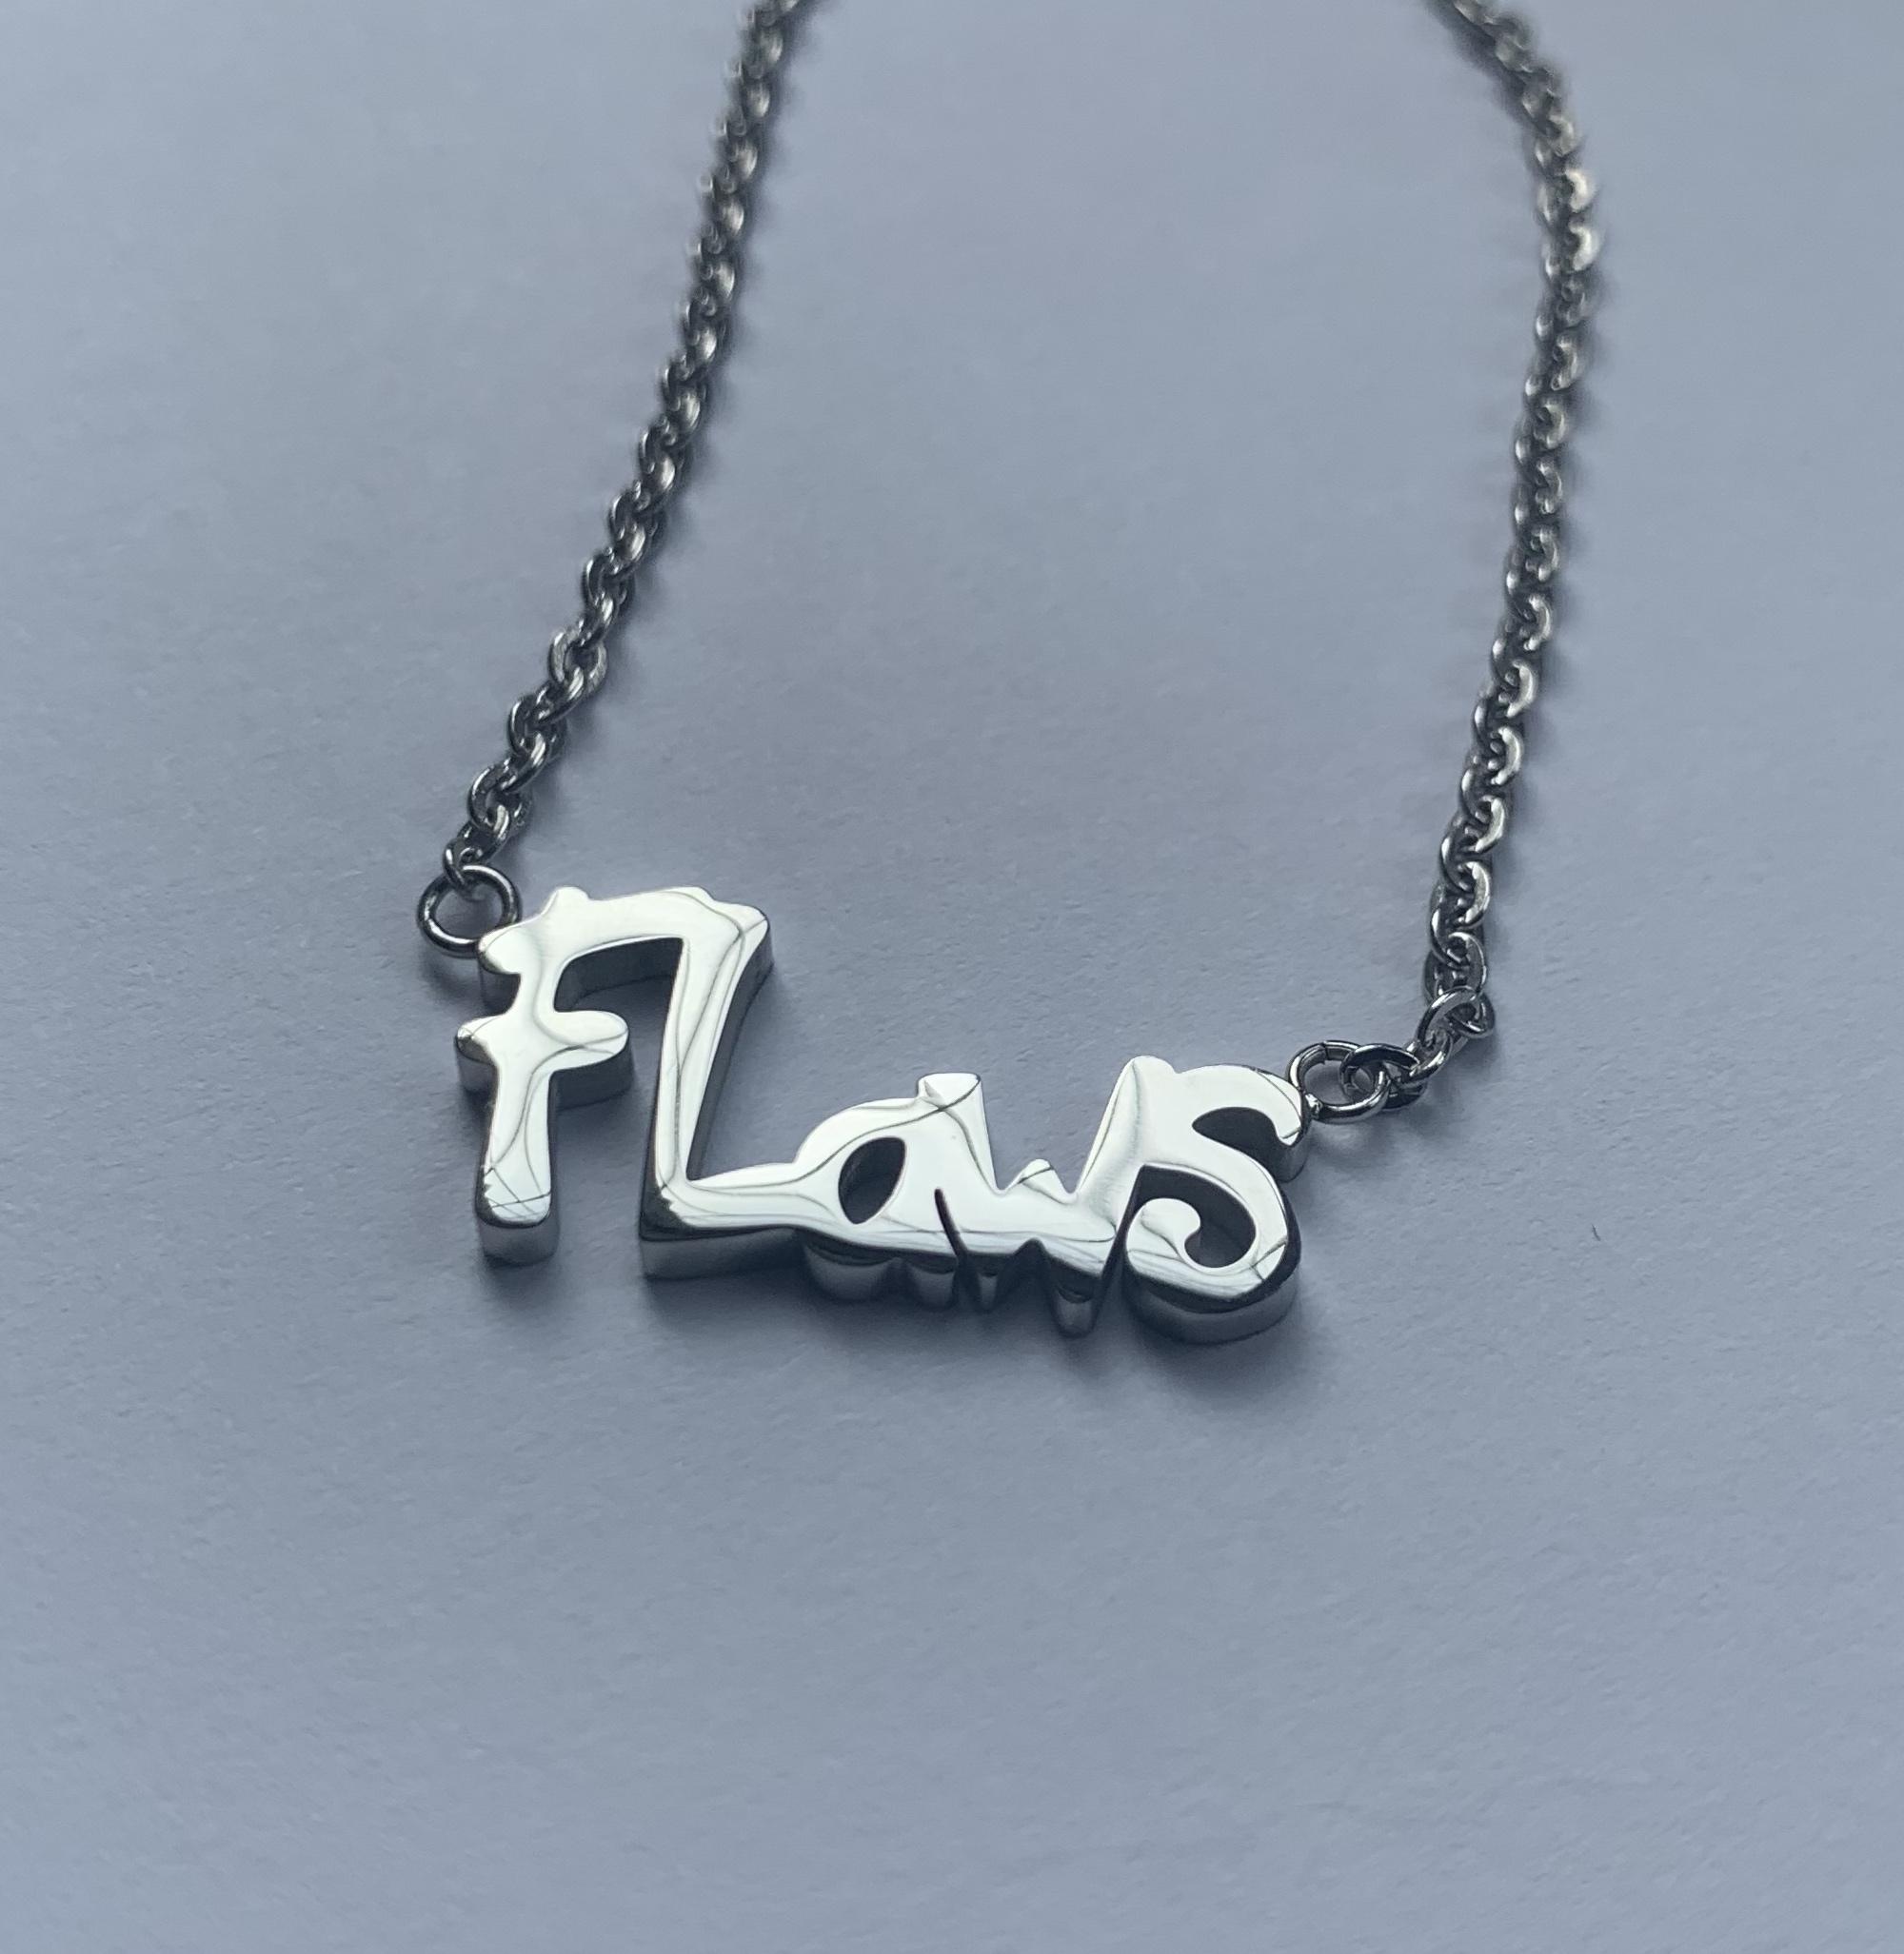 flaws ss 2.jpg